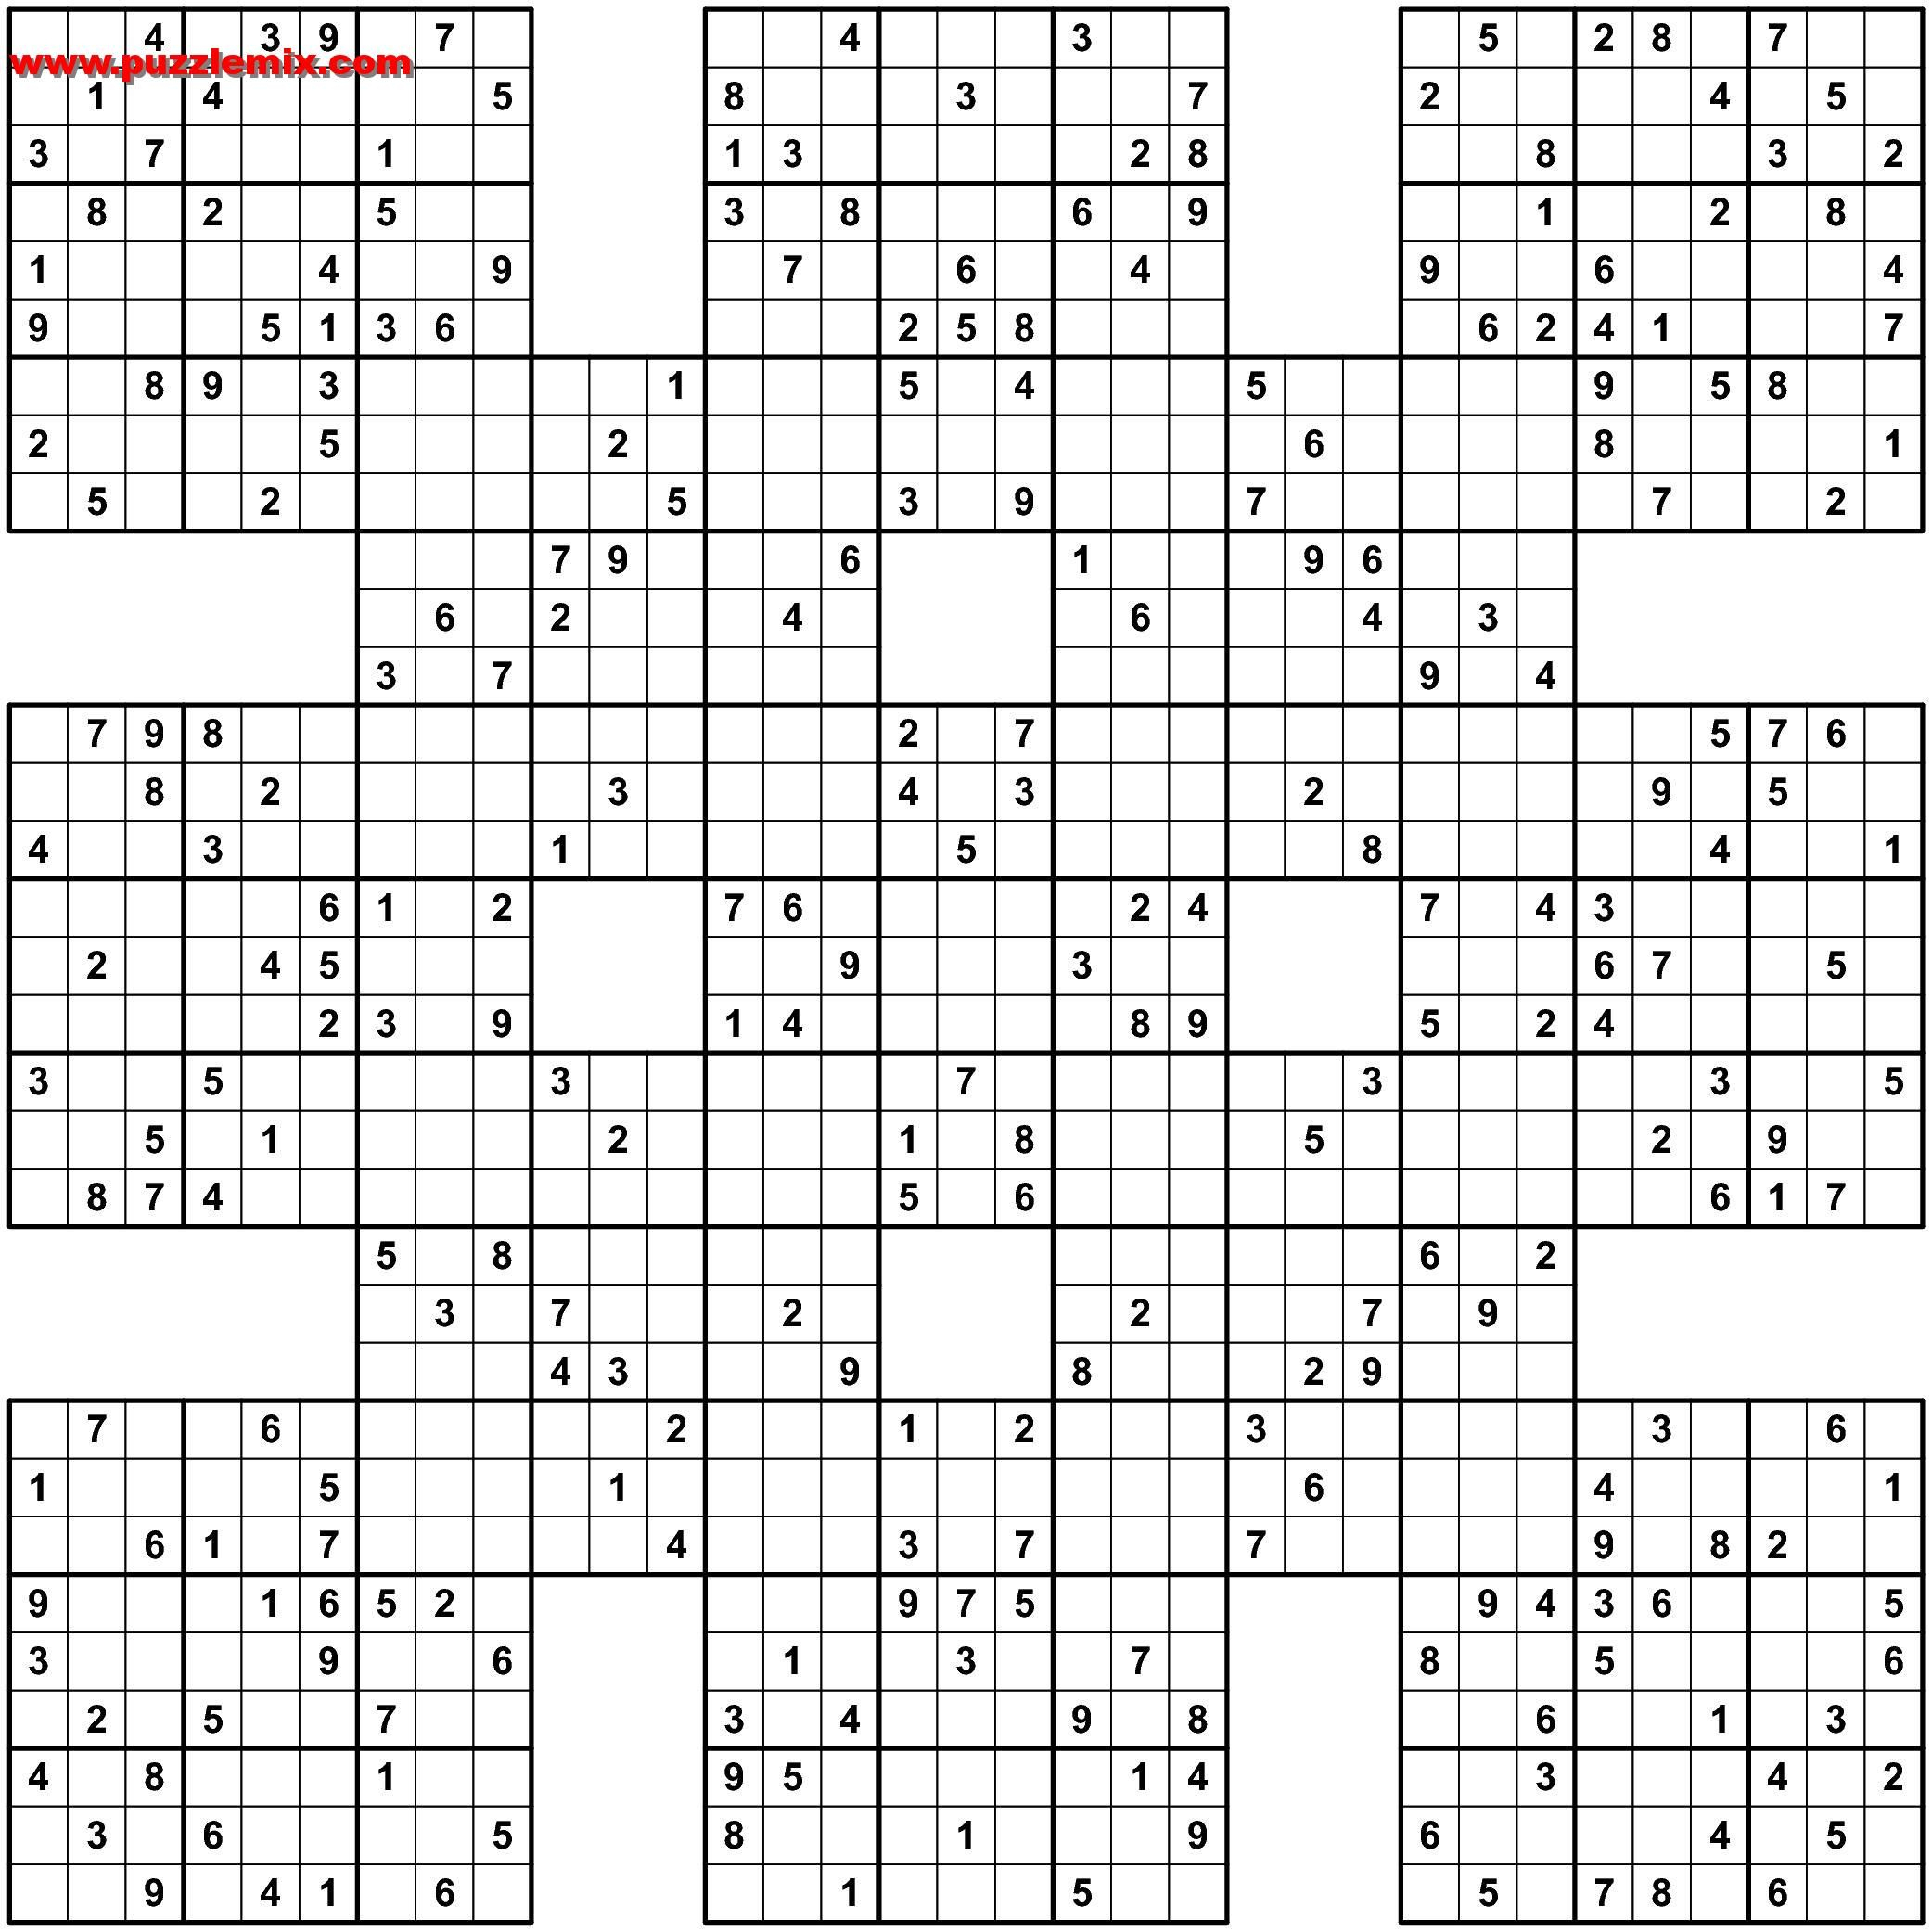 Pindiane Shepard On 13Grid 1 | Pinterest | Sudoku Puzzles - Sudoku 16X16 Printable Free